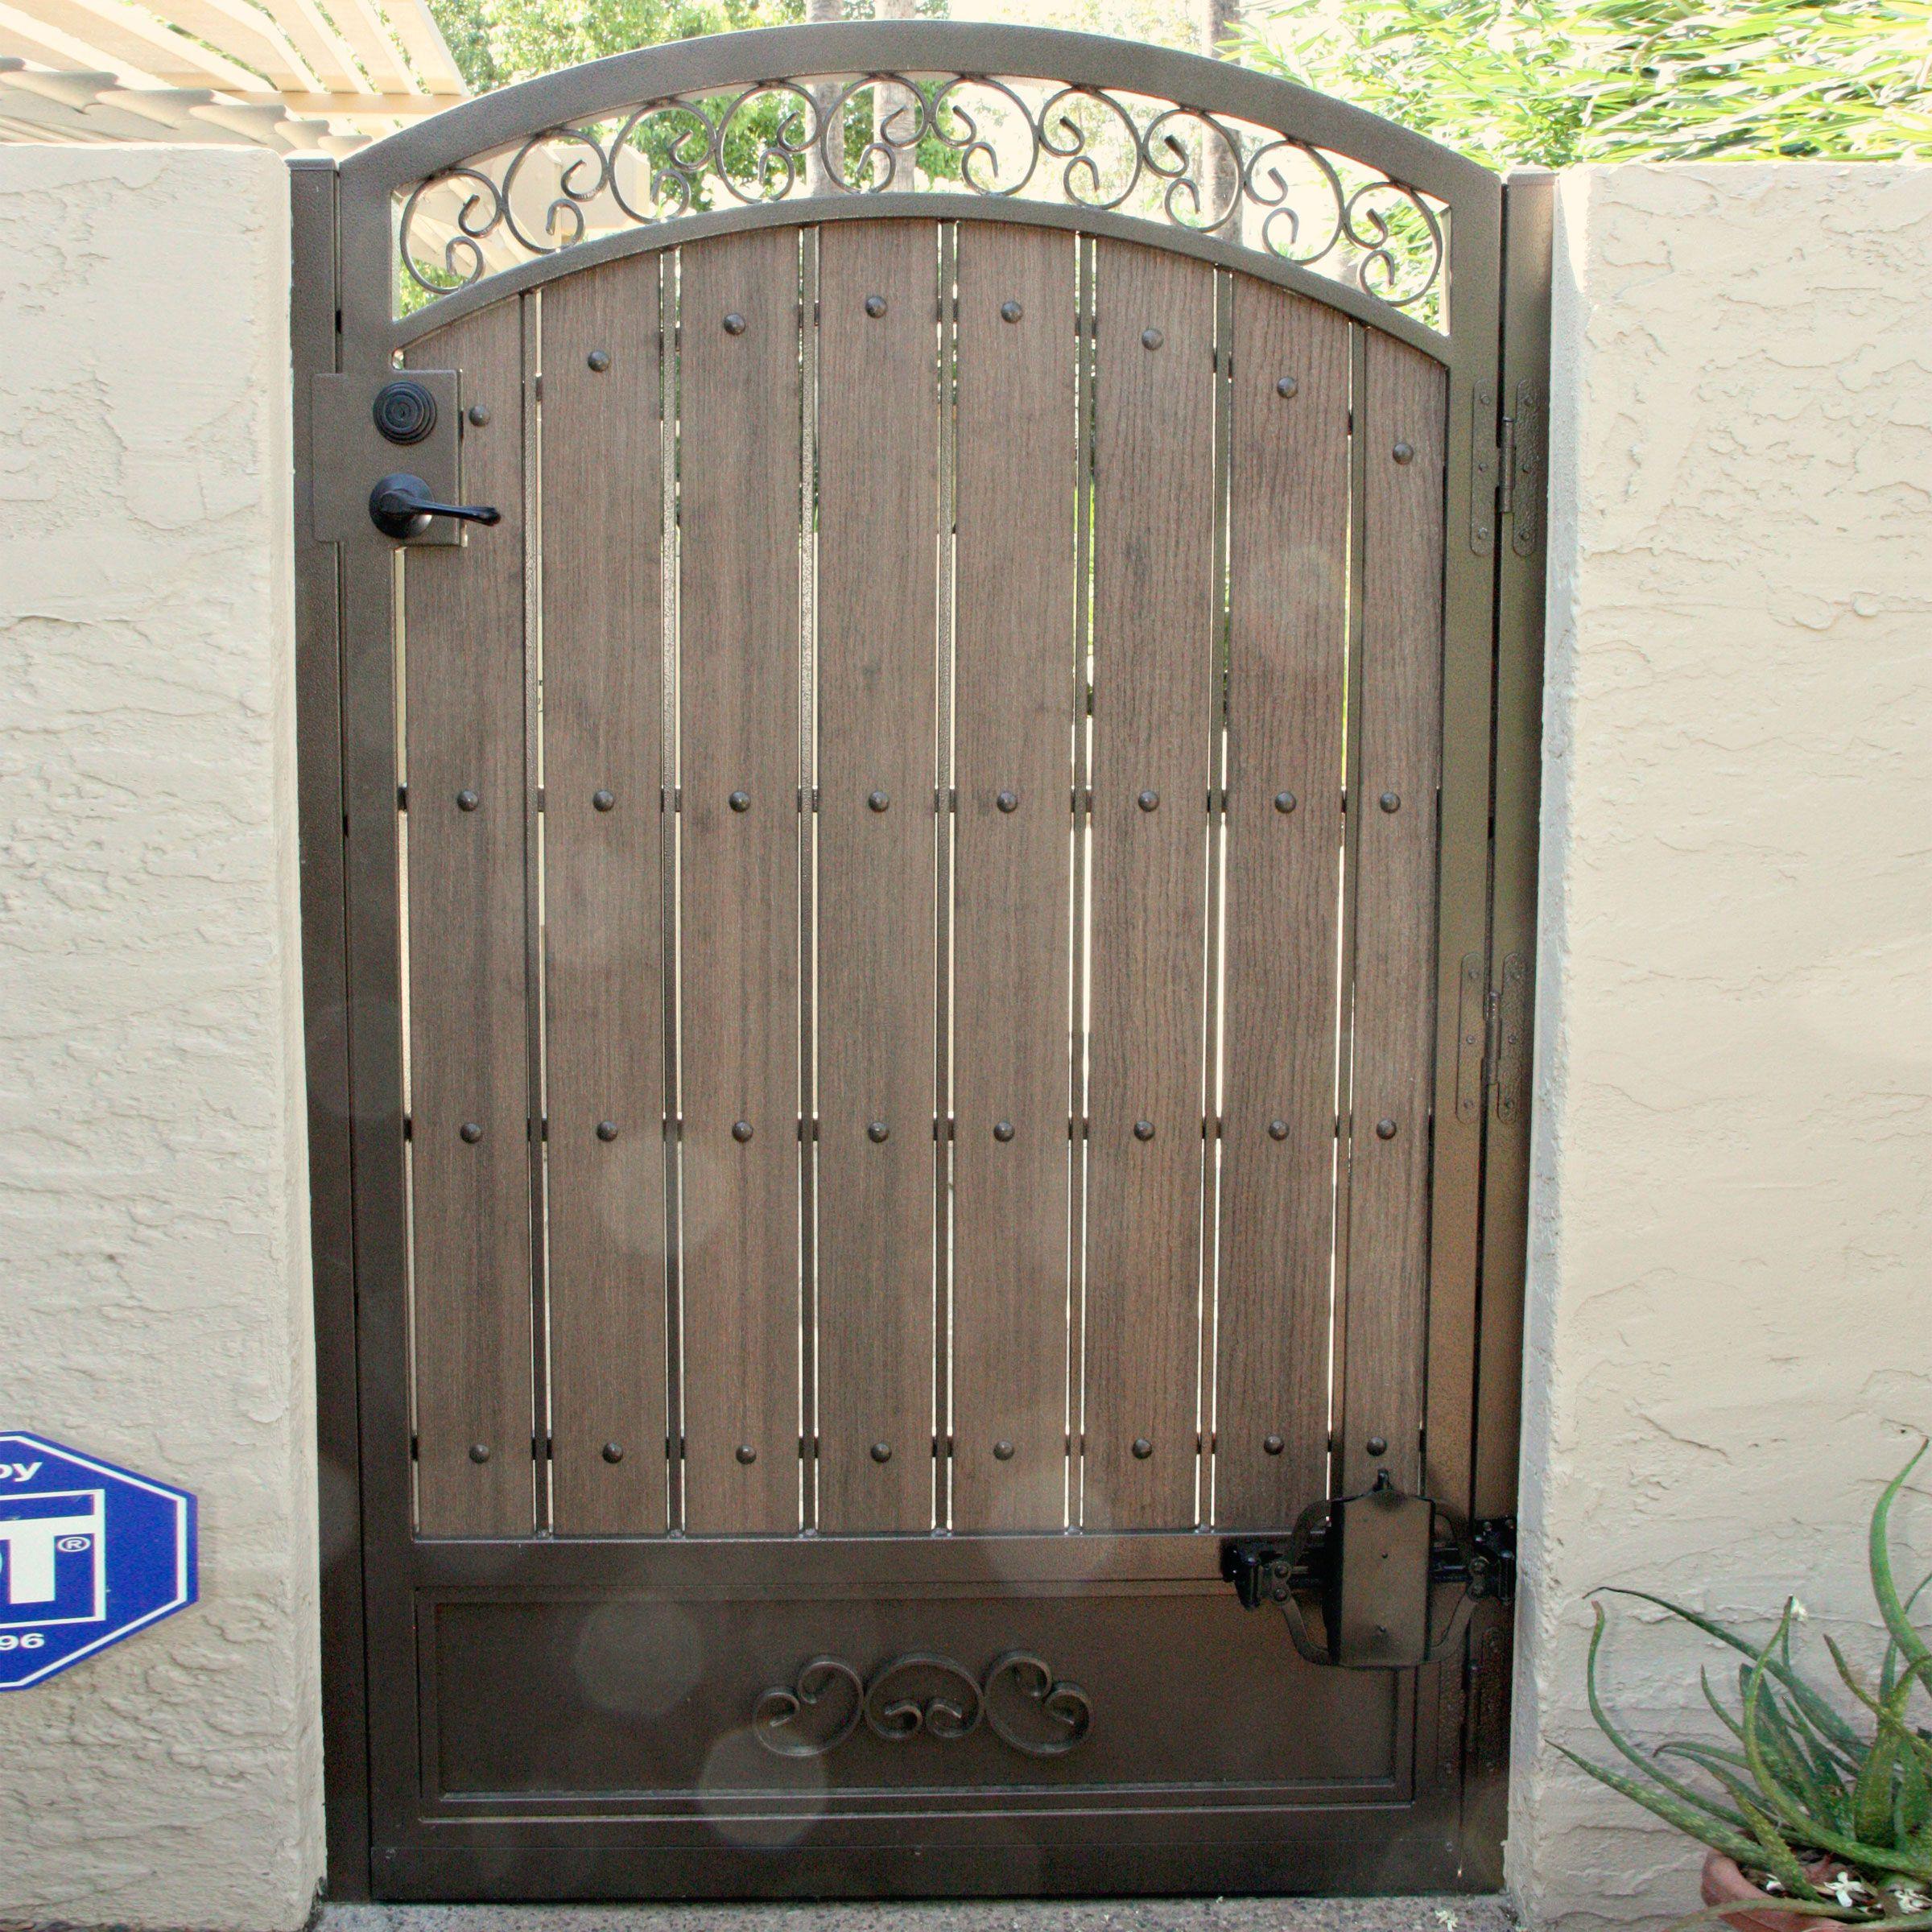 Californian | First Impression Security Doors & Californian | First Impression Security Doors | gates | Pinterest ... pezcame.com